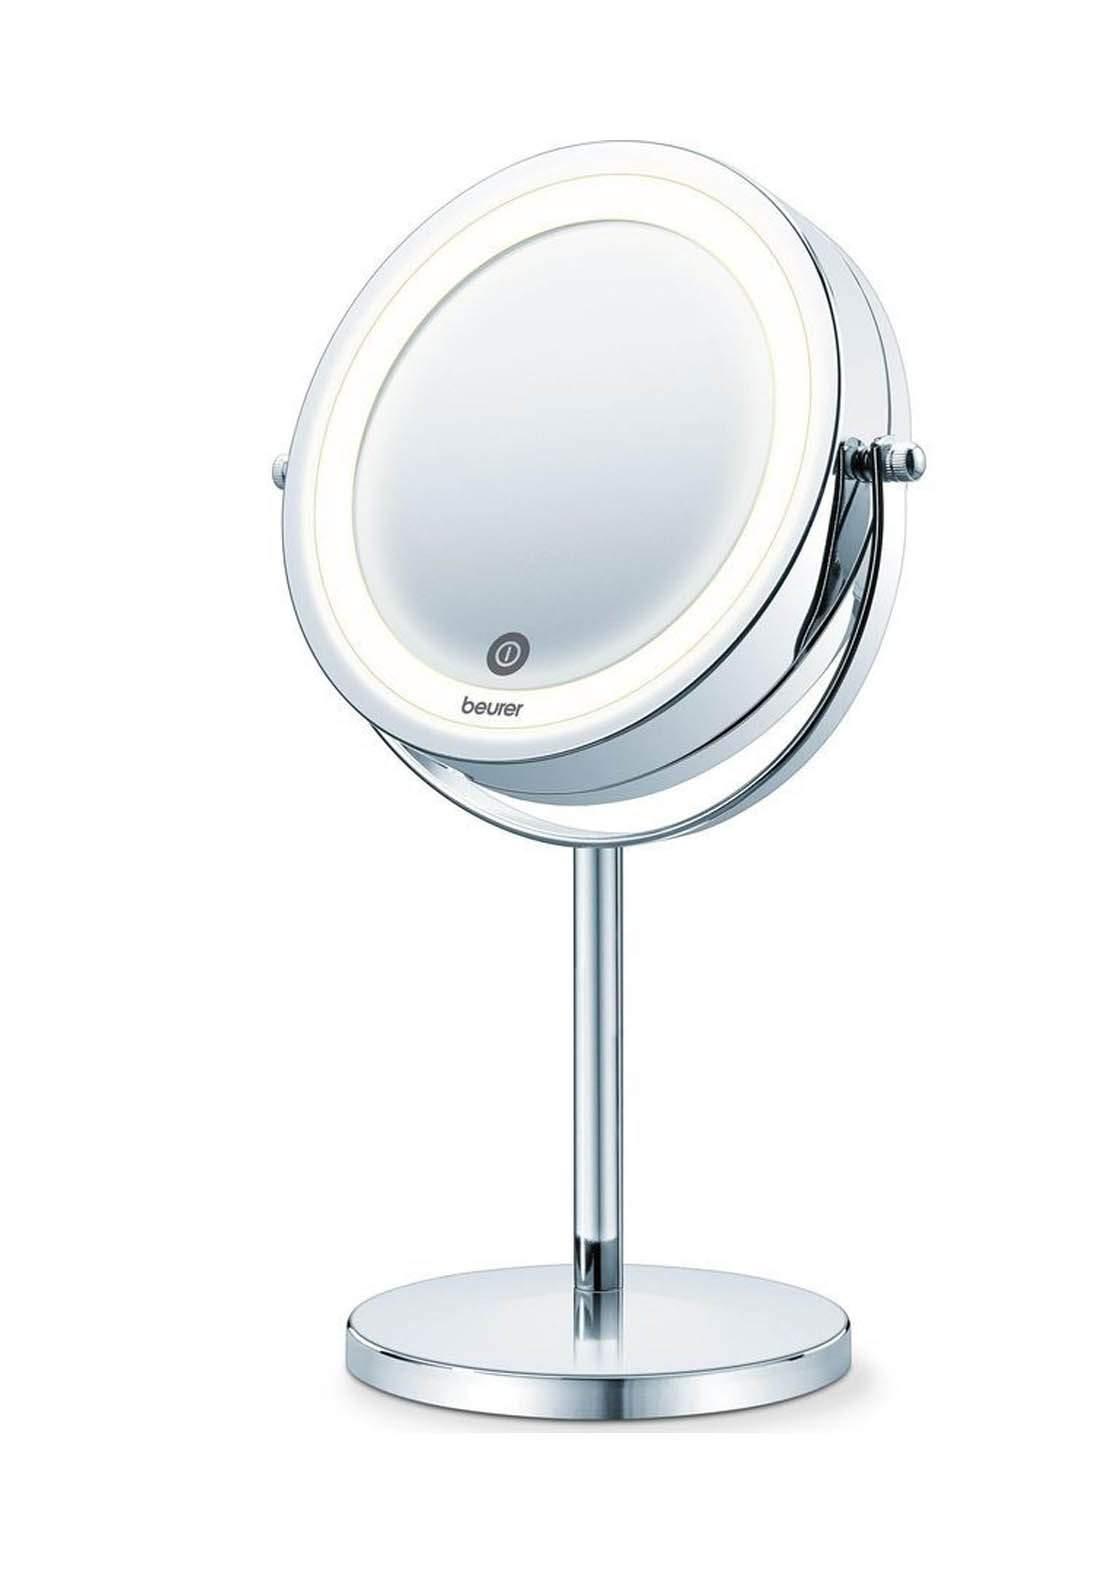 Beurer BS 55 Illuminated Cosmetics Mirror مرآة مضاءة مكبرة